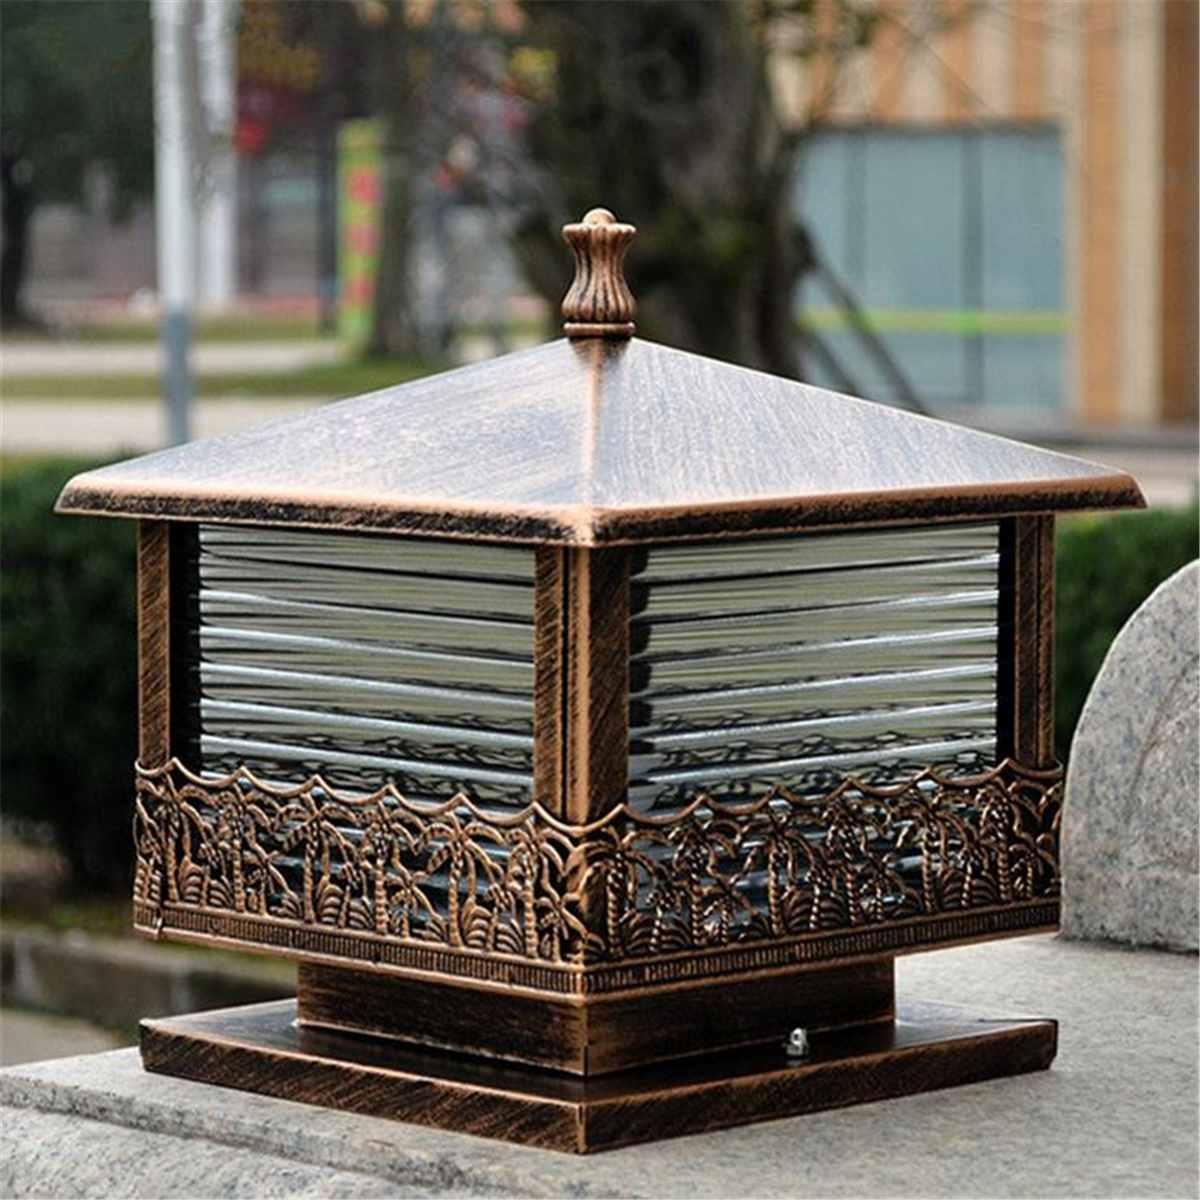 Black Bronze Vintage Pillar Light Garden Gate Post Lamp Glass Lantern Outdoor Patio Yard Landscape Lighting Night Lamp